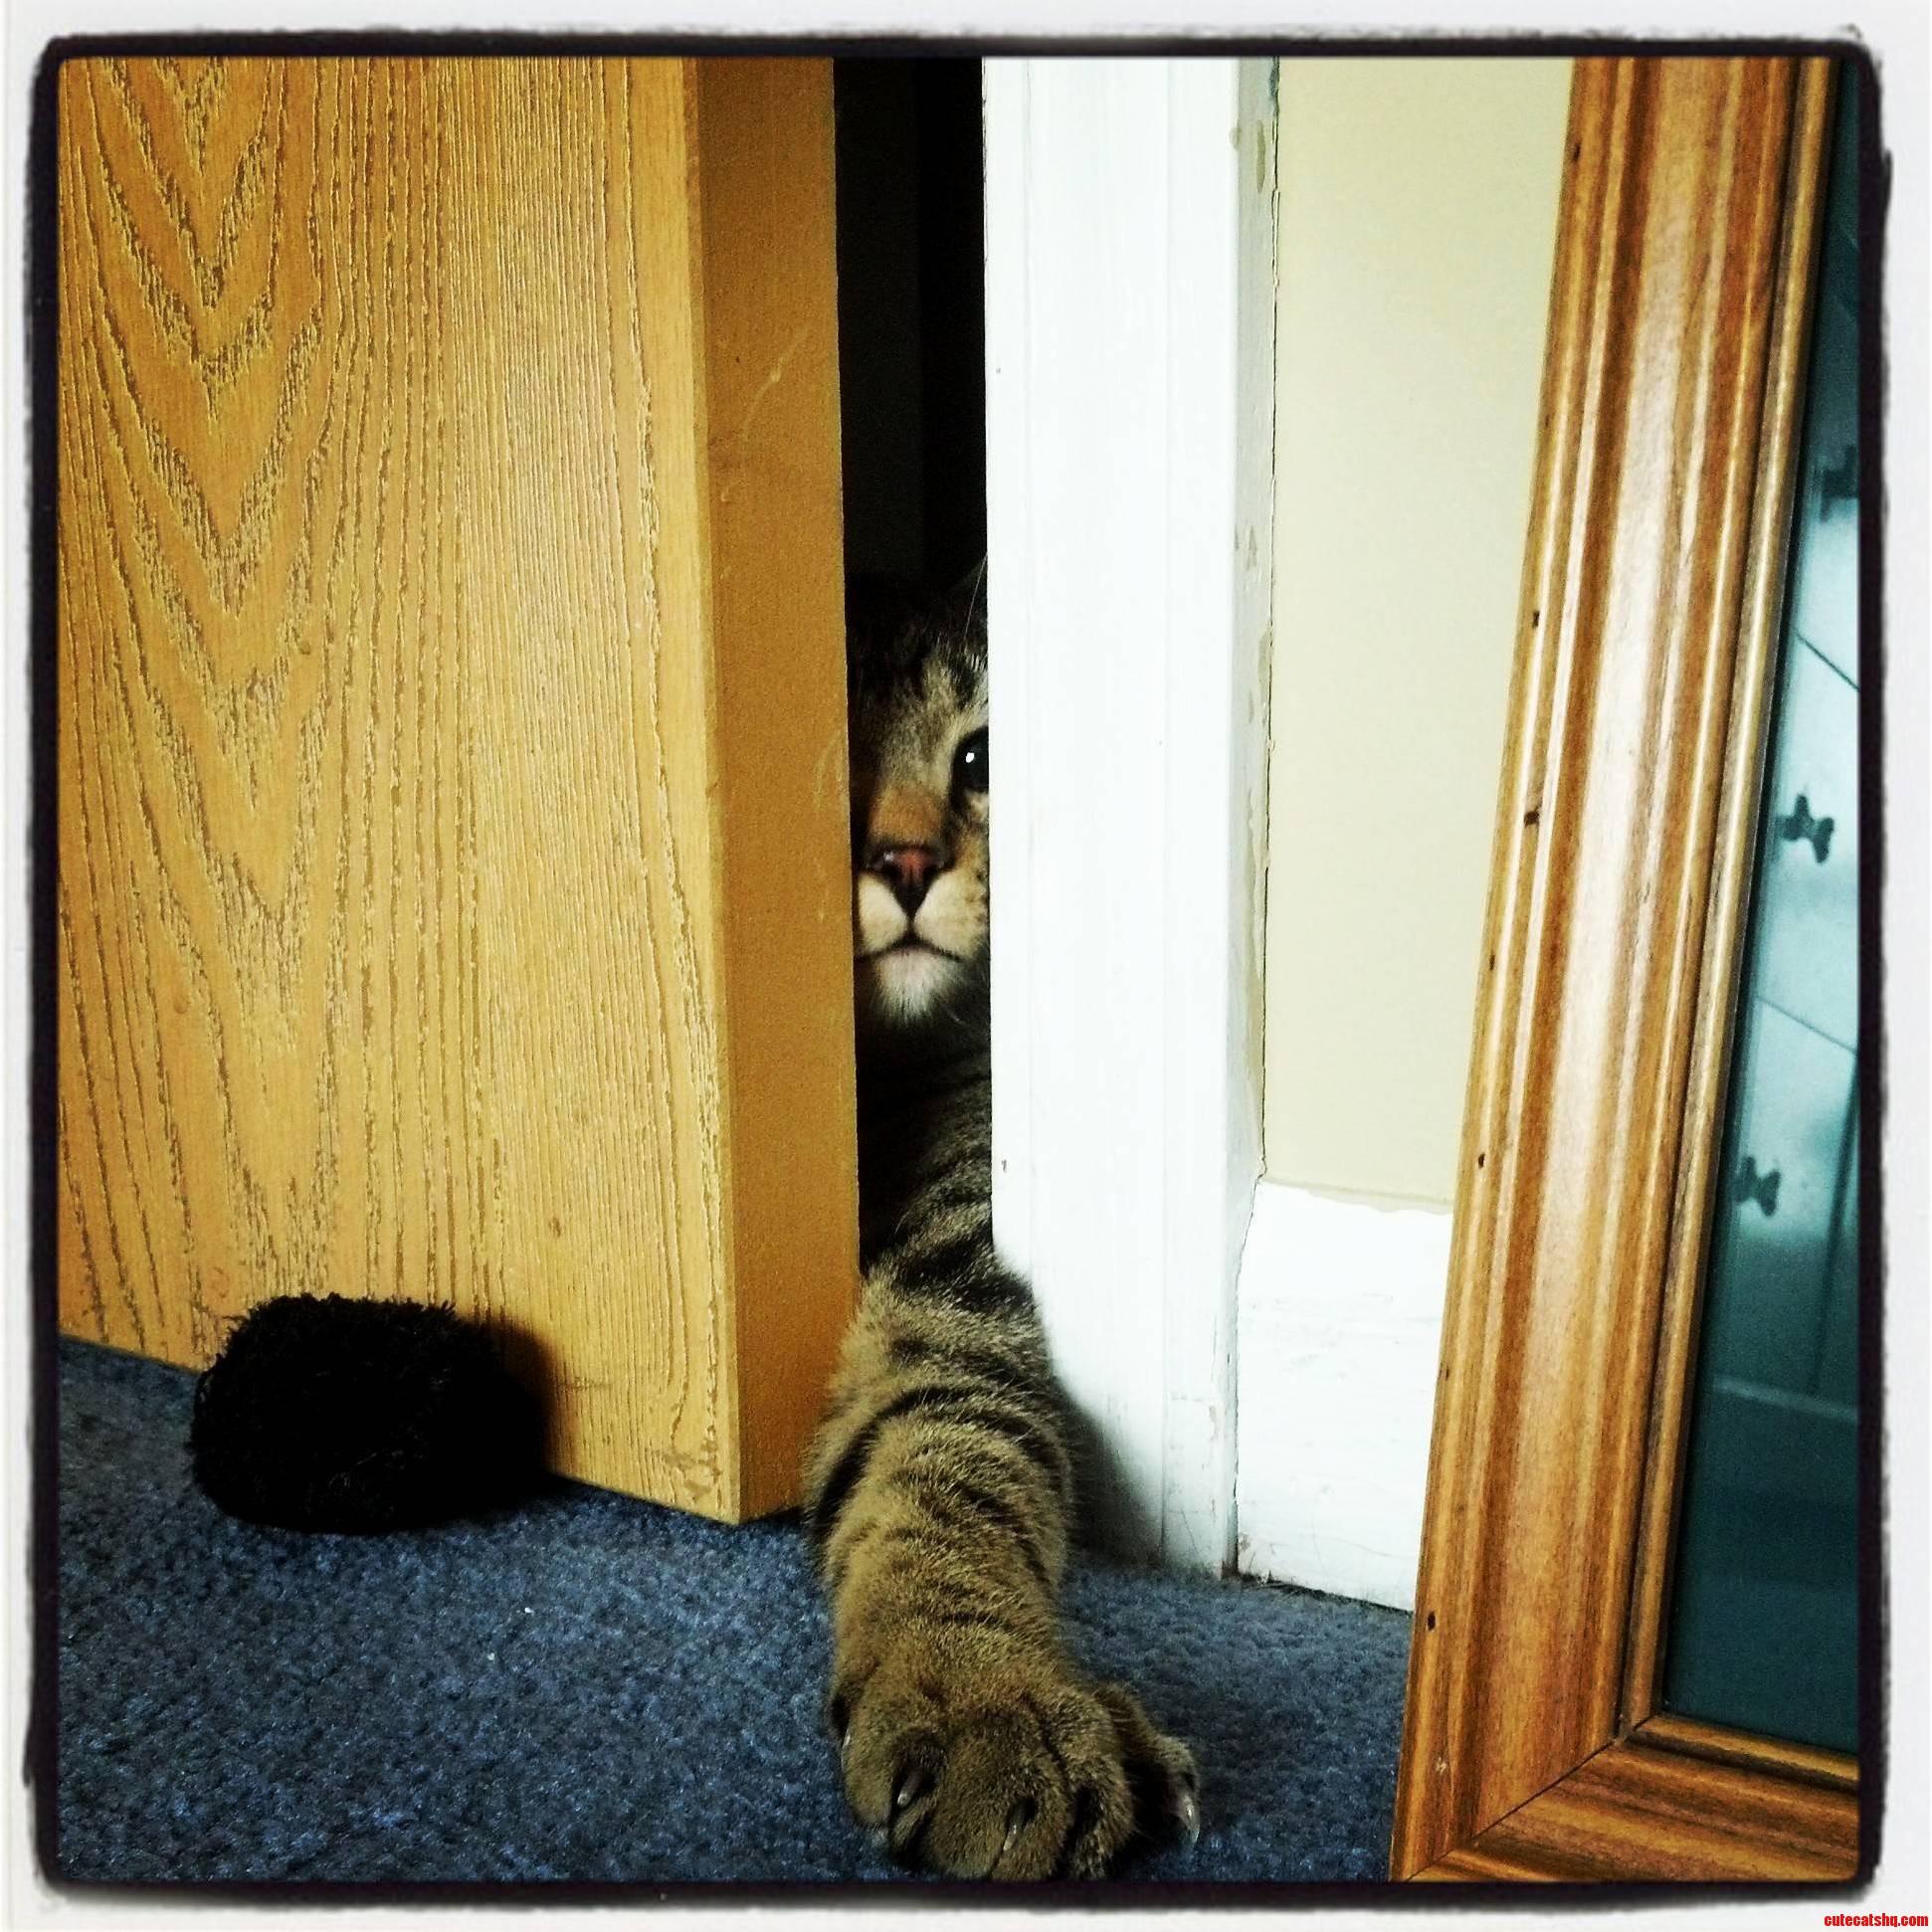 Roommates Kitten Trying To Sneak In